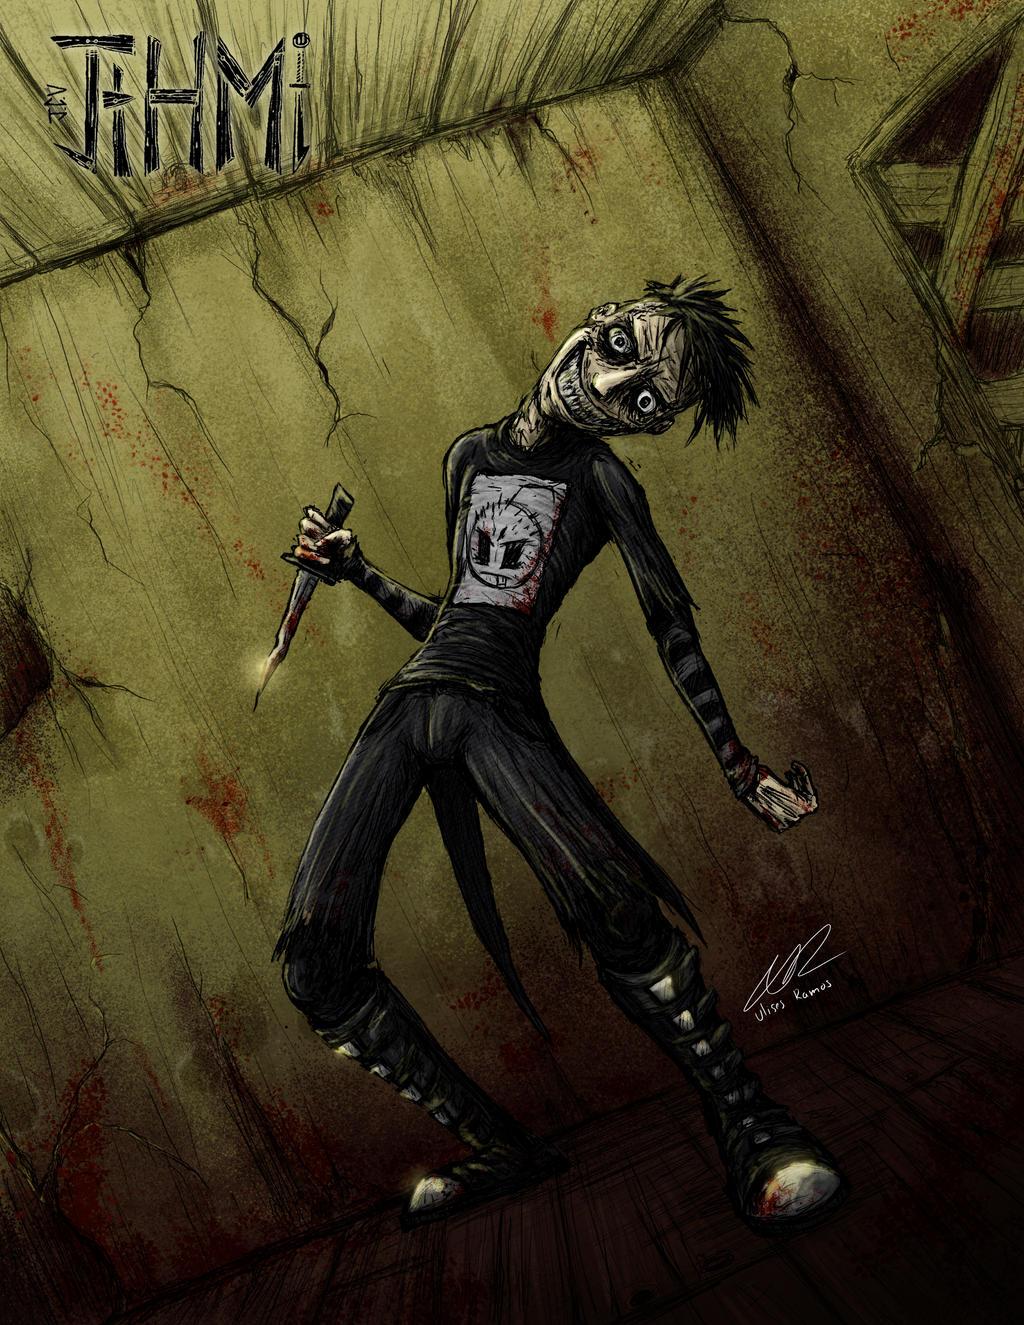 Johnny the Homicidal Maniac by ulitomamon on DeviantArt